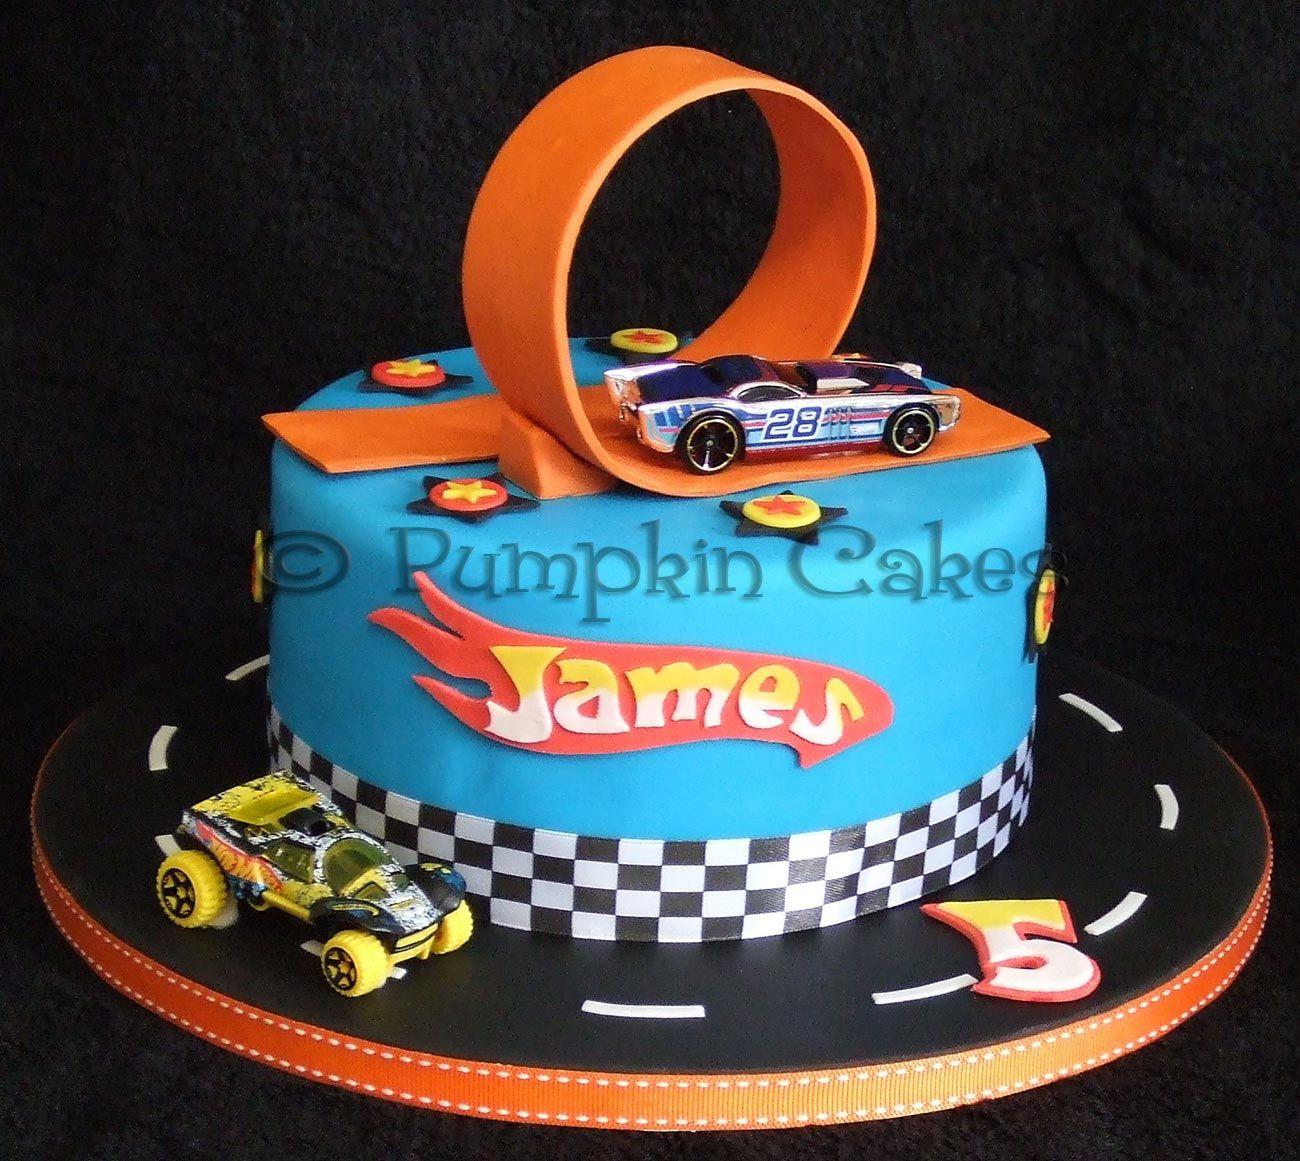 Cake Decorating Mud Cake Recipe : Yummy chocolate mud cake in a Hot Wheels design. Cake ...